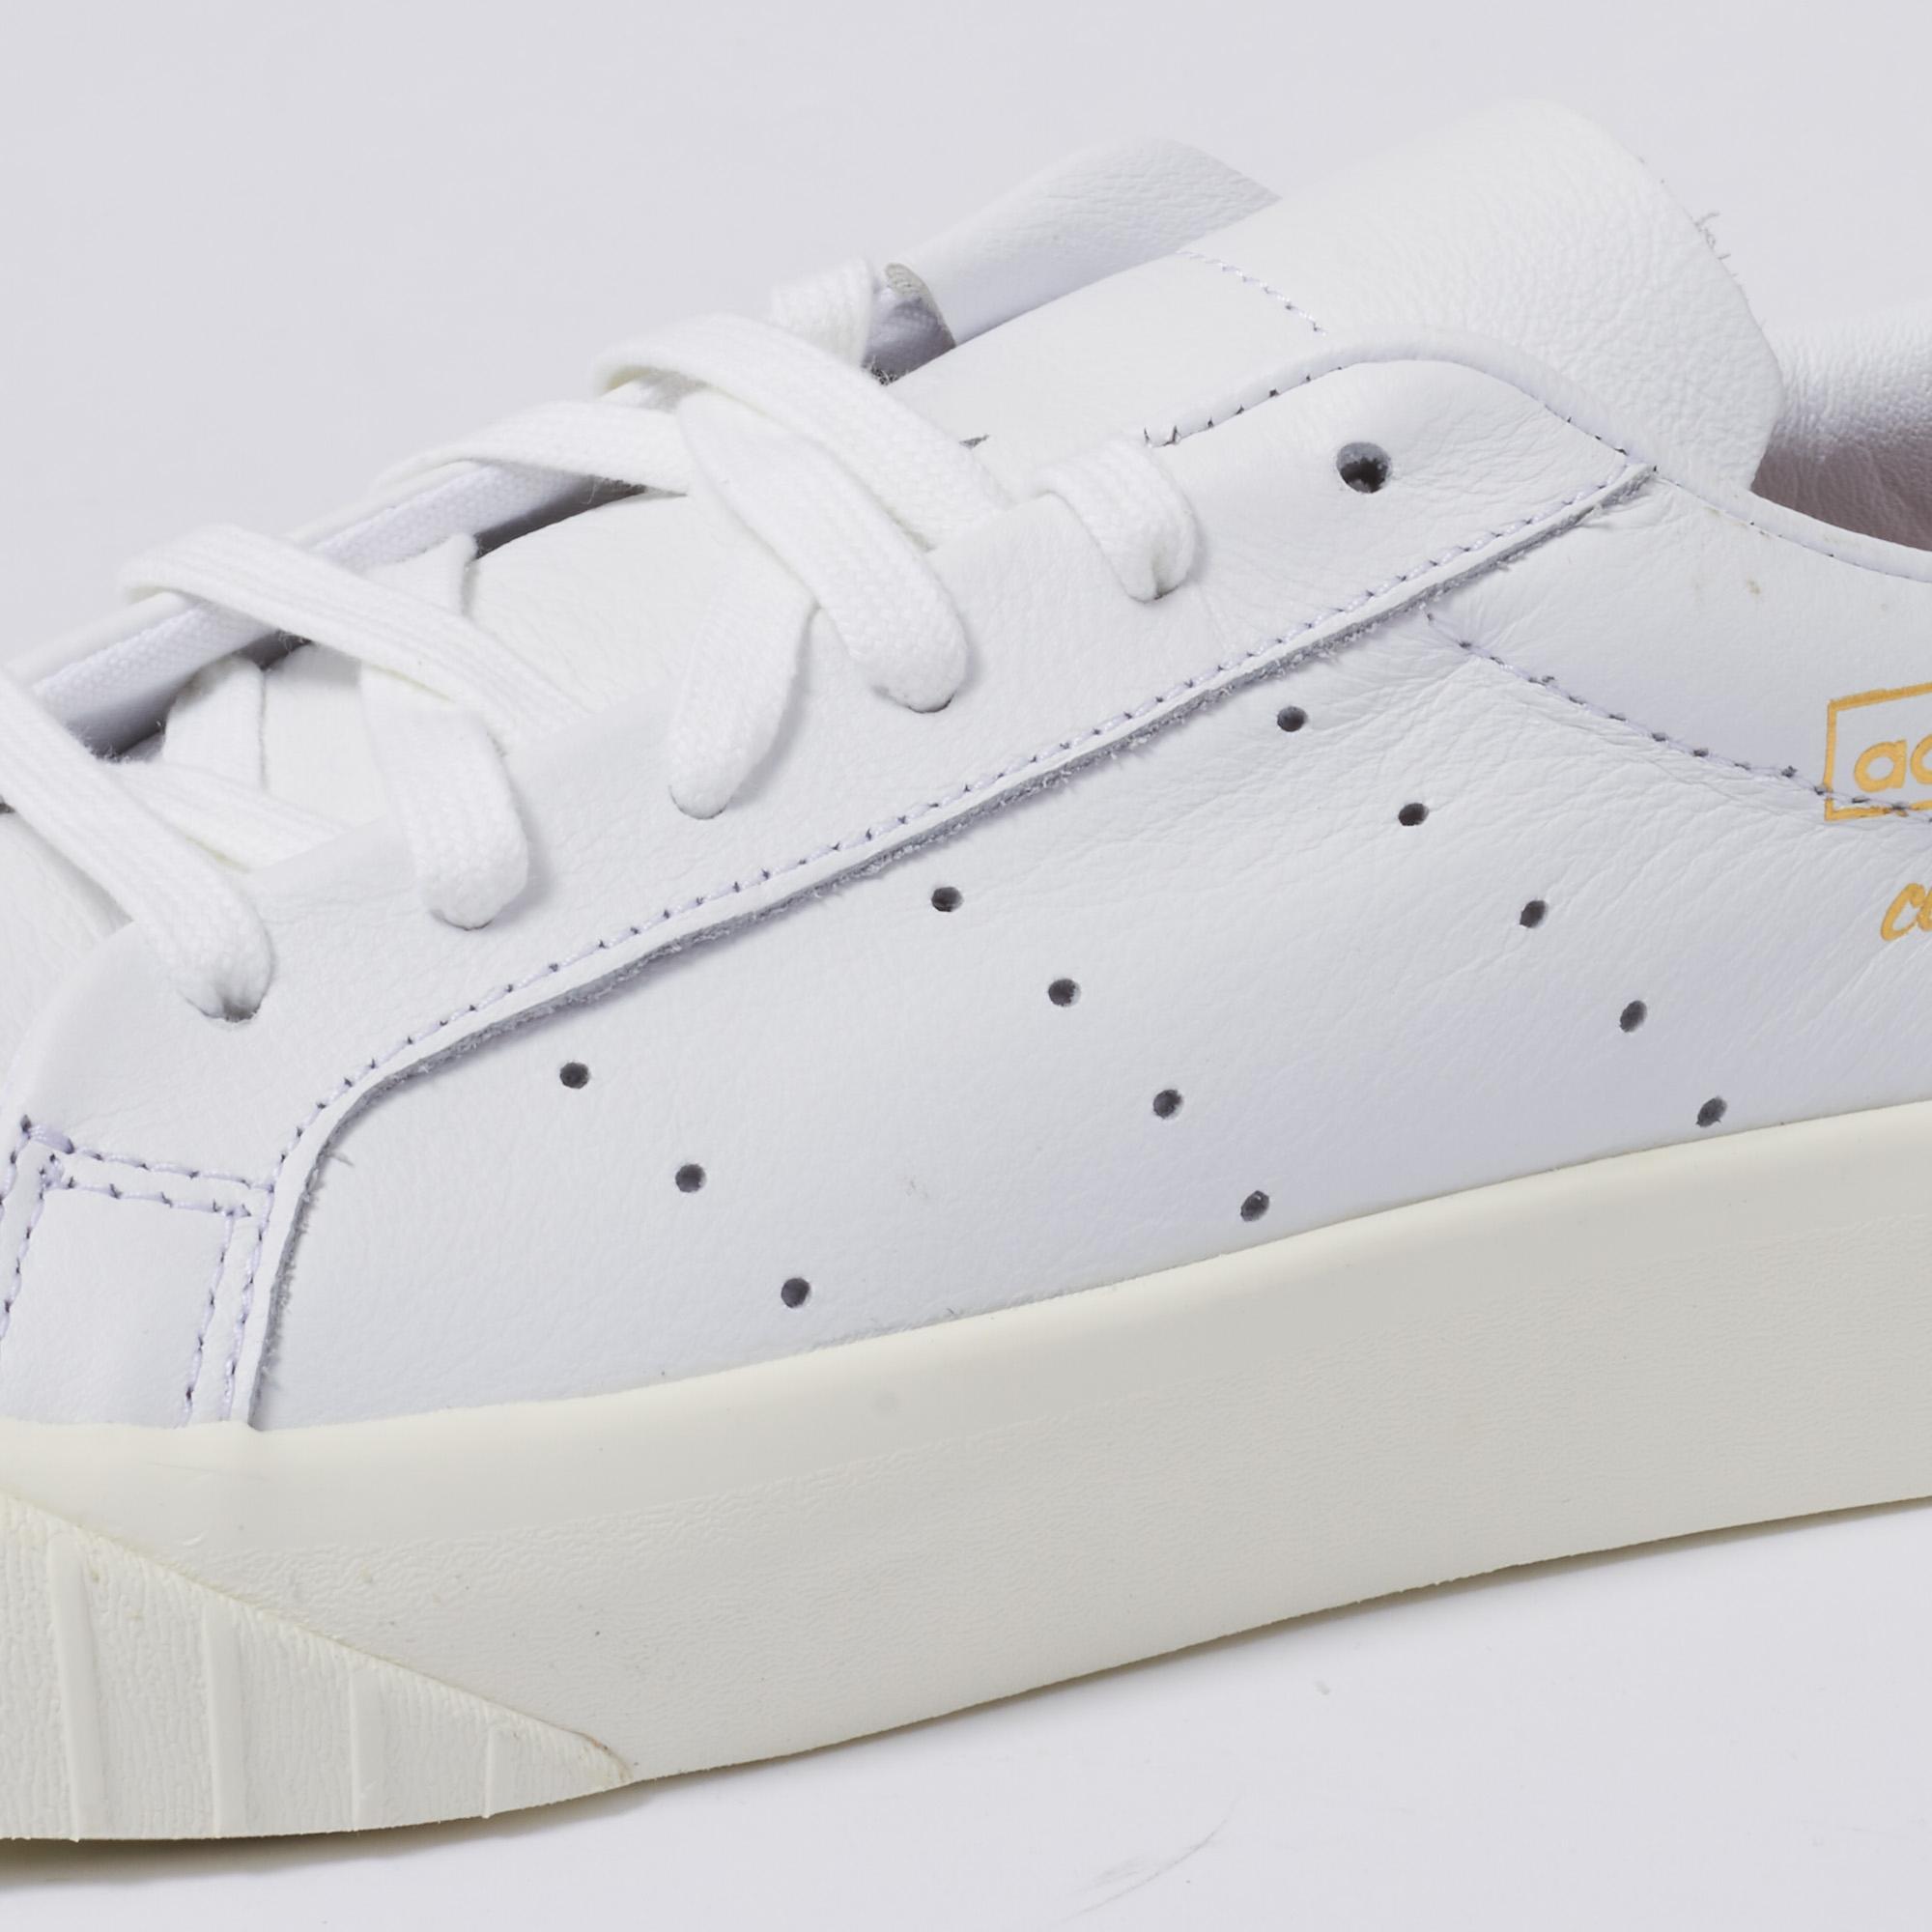 7ab53742974 adidas Originals Everyn Trainers - Ftwr White   Ash Pink in White ...